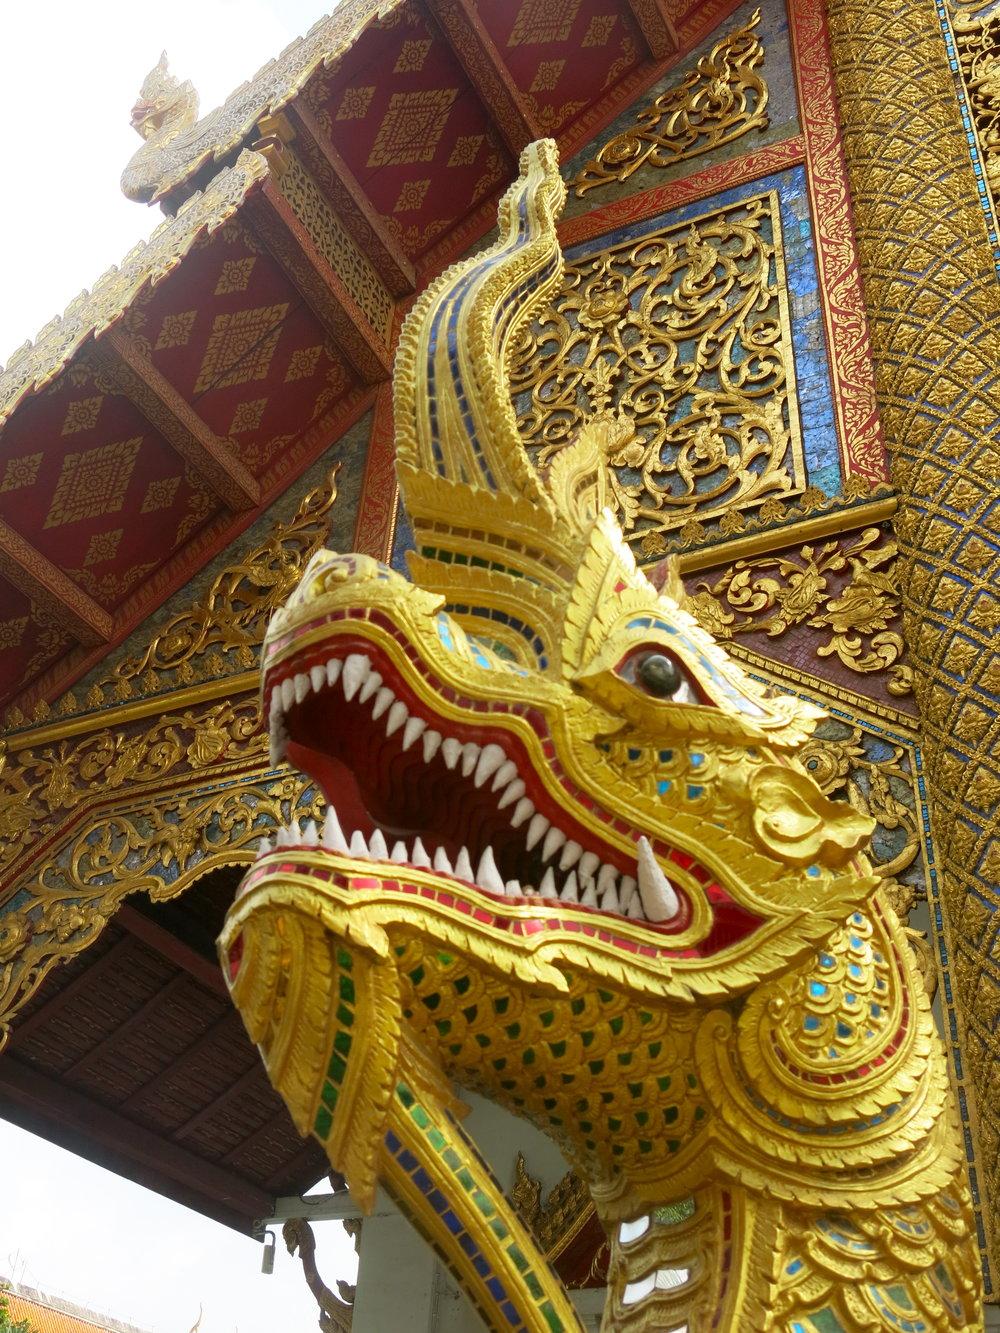 A golden Naga, a dragon-like figures guarding Buddhist temples